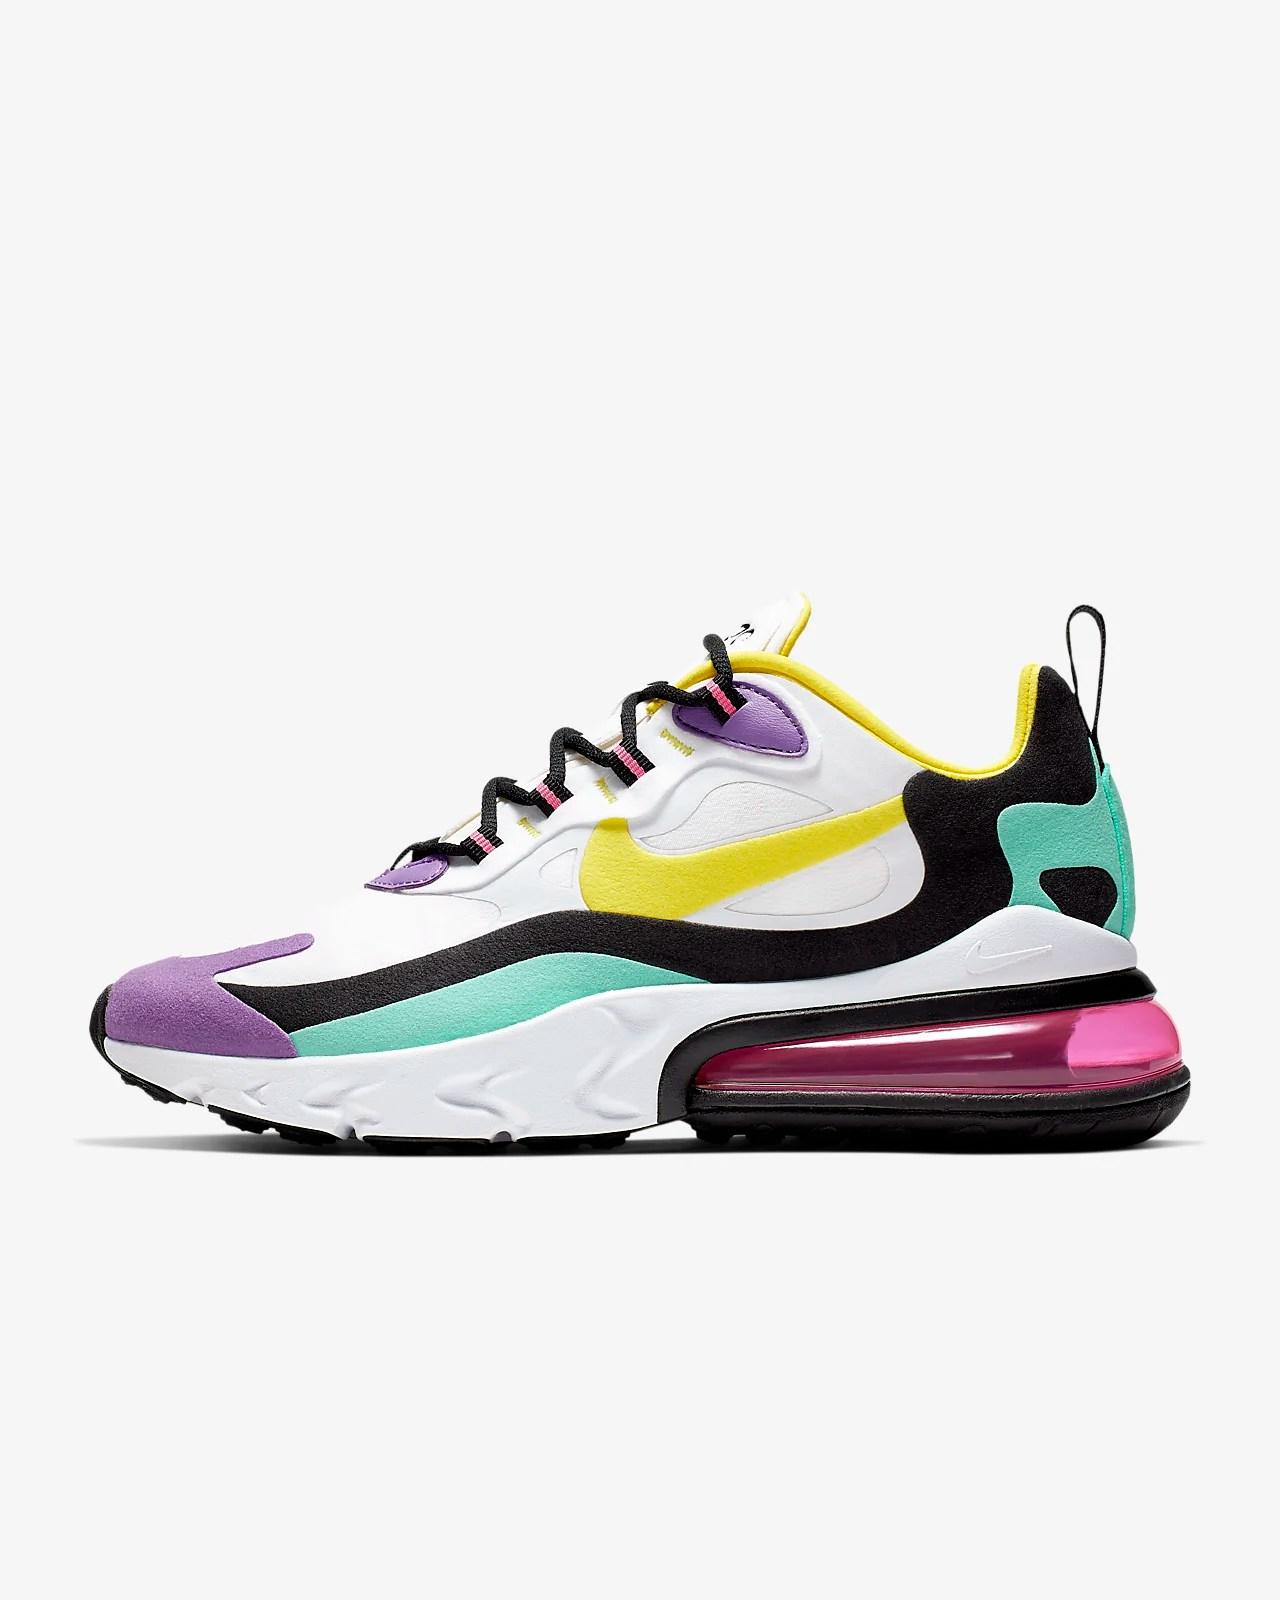 Nike Air Max 270 React (Geometric Abstract) 女鞋. Nike TW